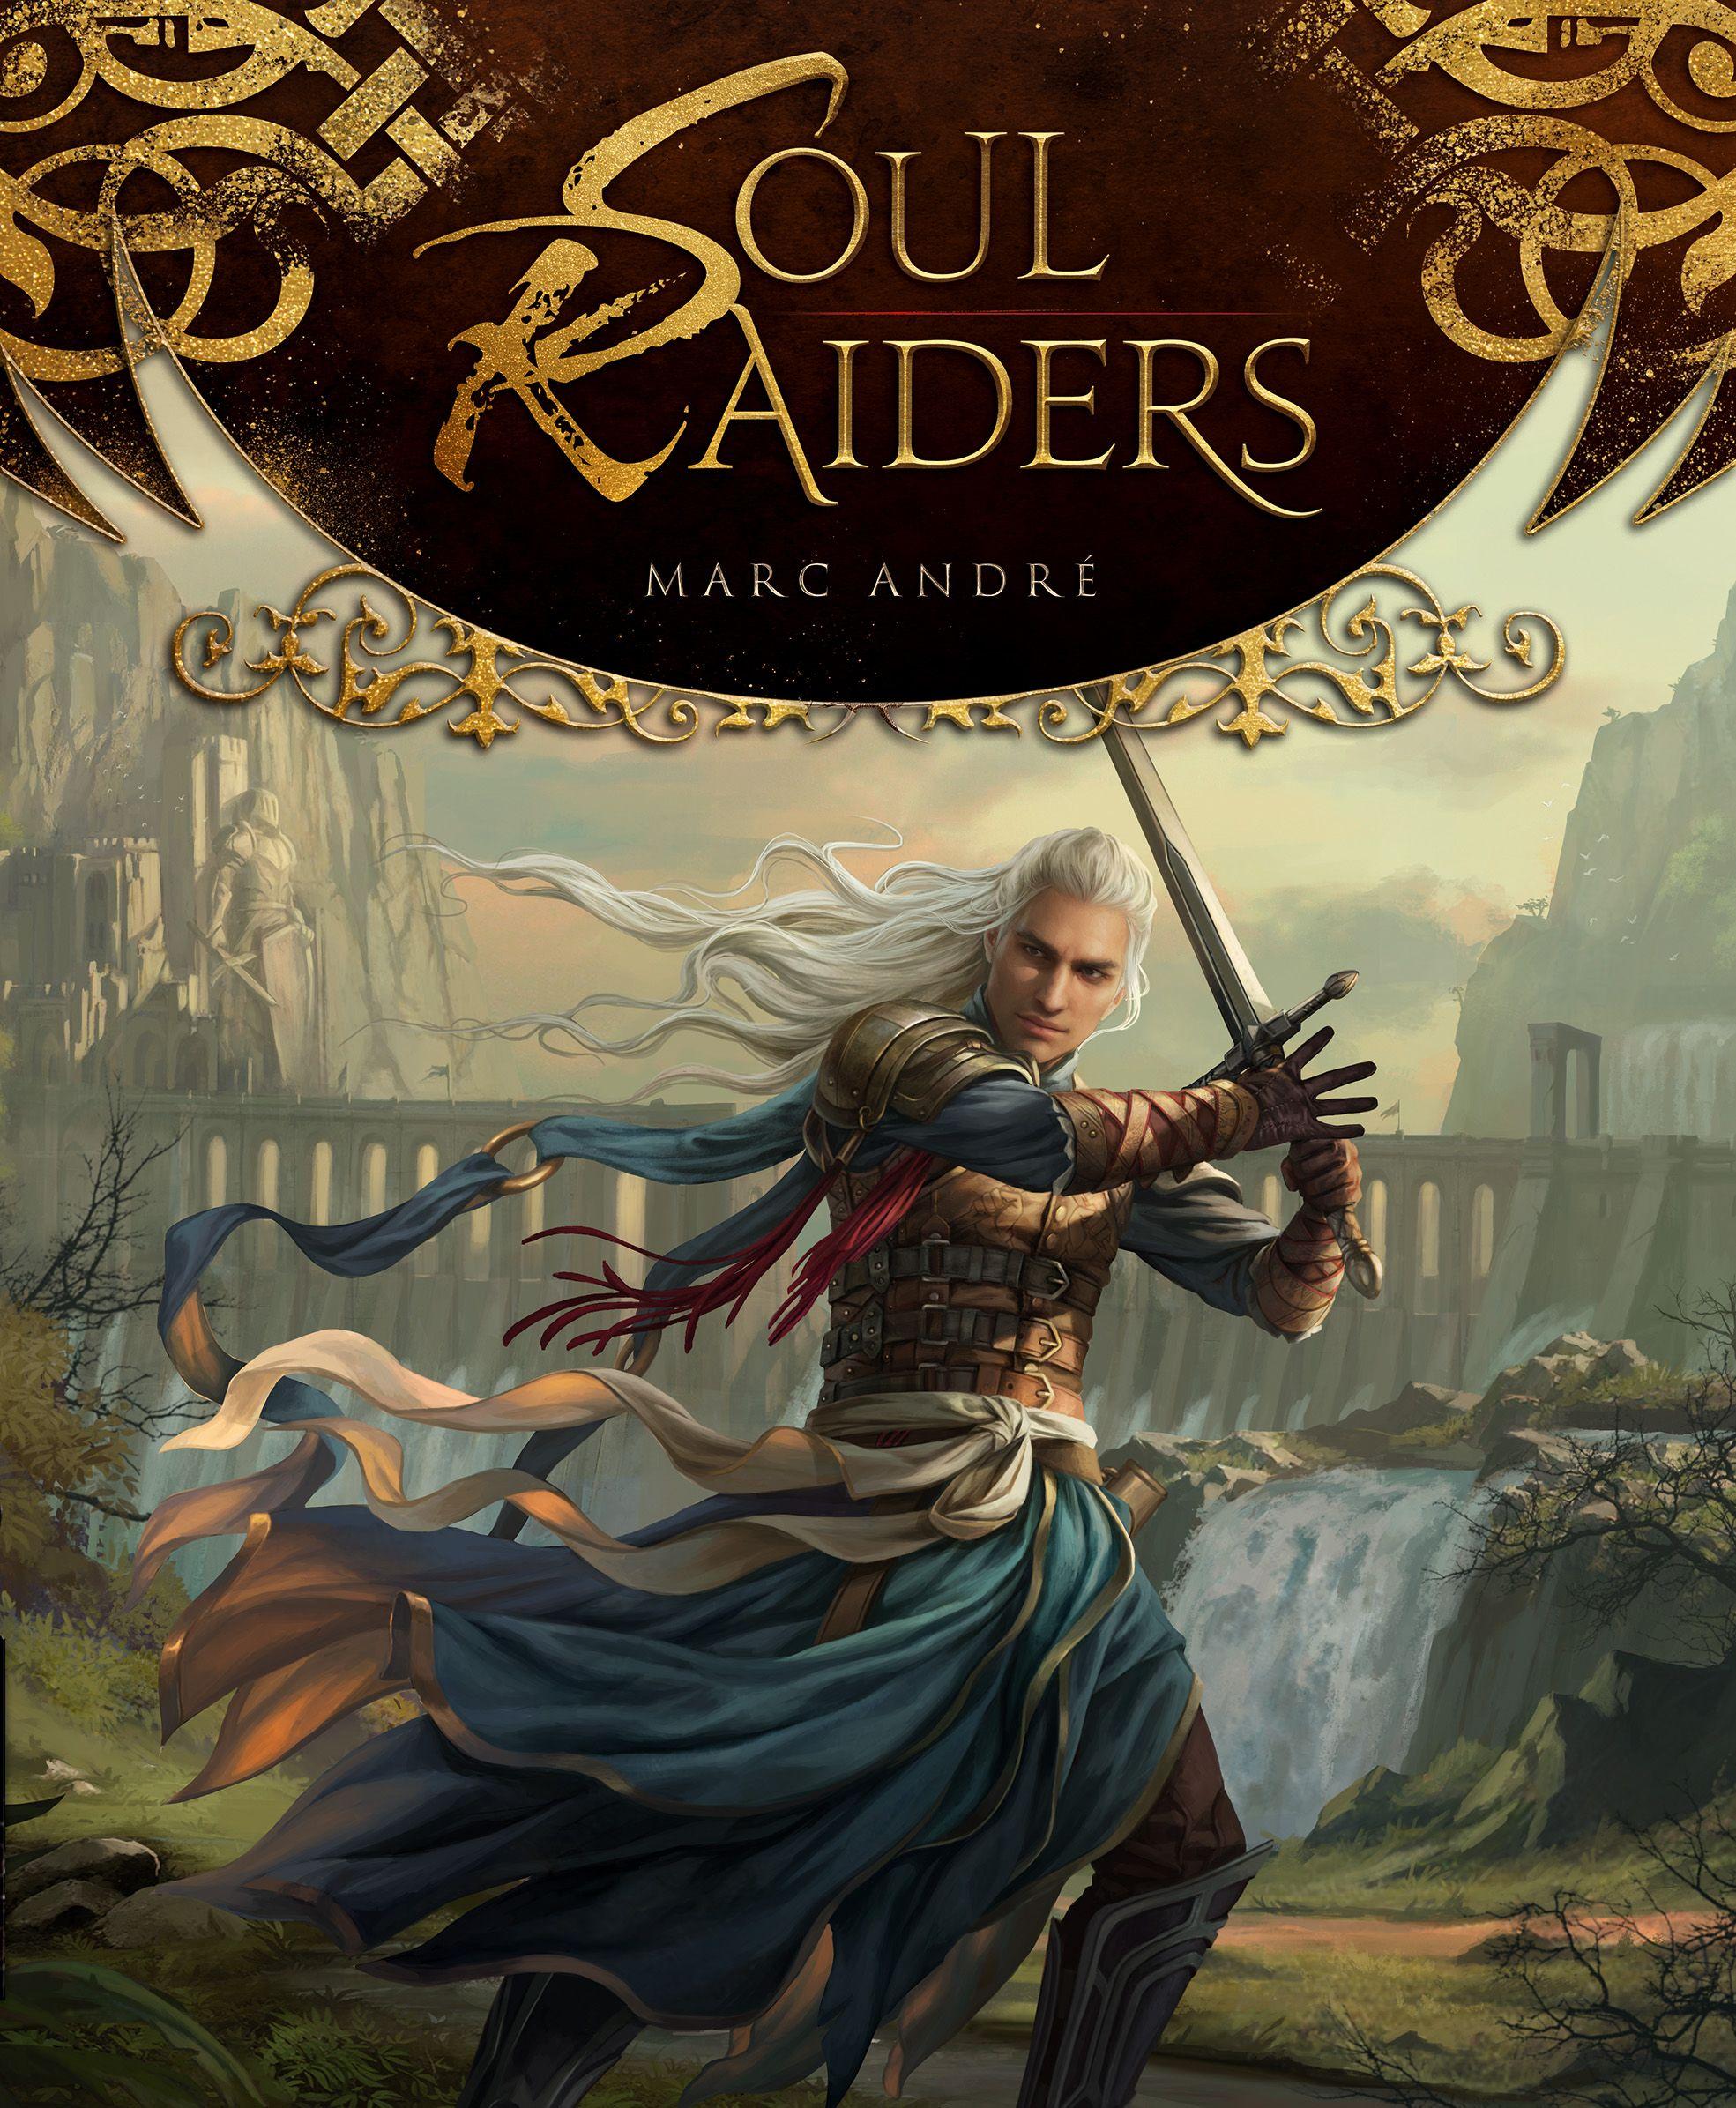 настольная игра Soul Raiders